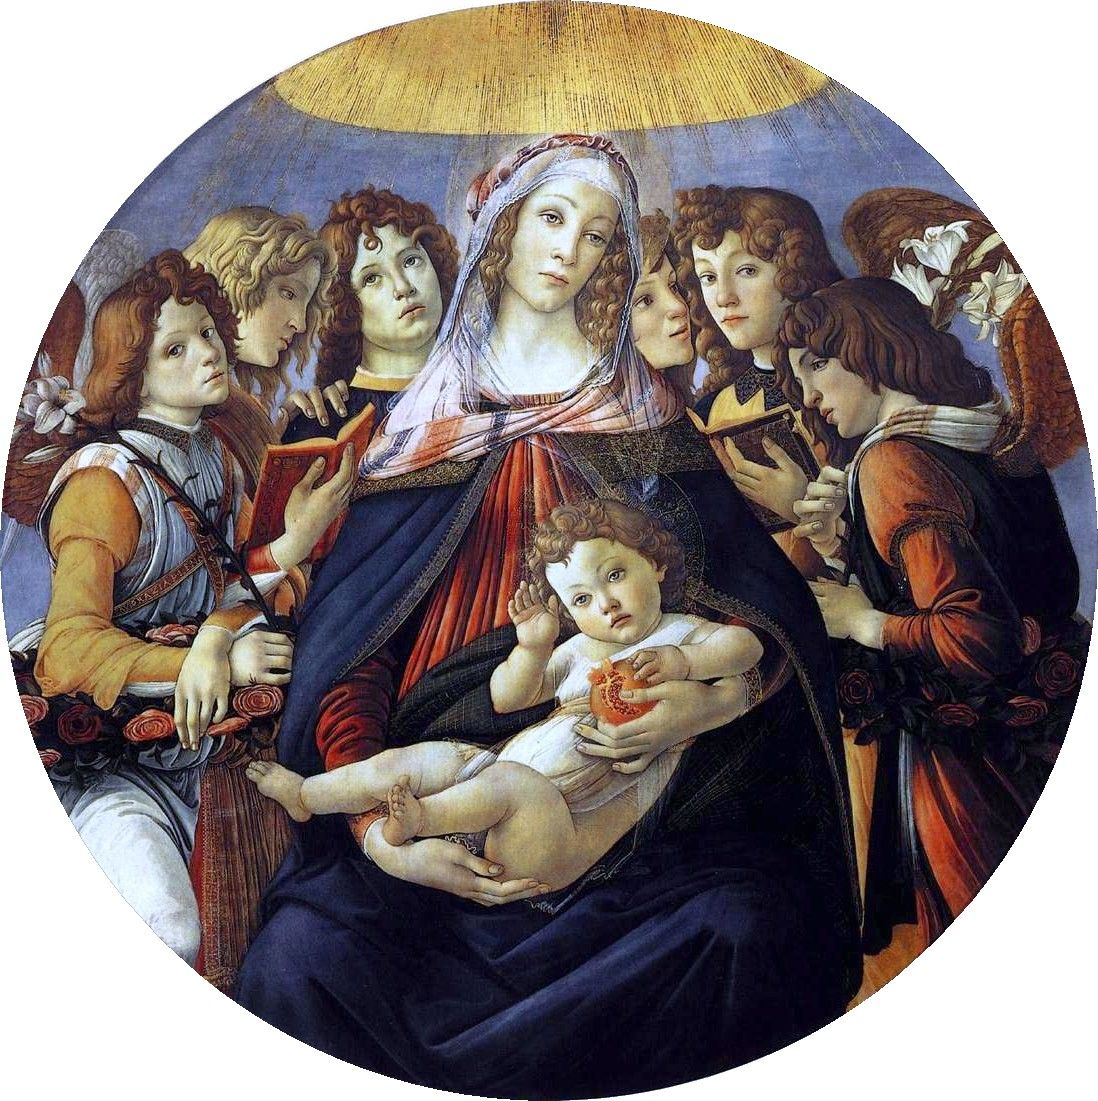 Sandro Botticelli ~ Madonna en Kind met engelen (De Madonna met de granaatappel) ~ ca. 1487 ~ Tondo ~ Tempera op hout ~ Diameter 143,5 cm. ~ Galeria degli Uffizi, Florence